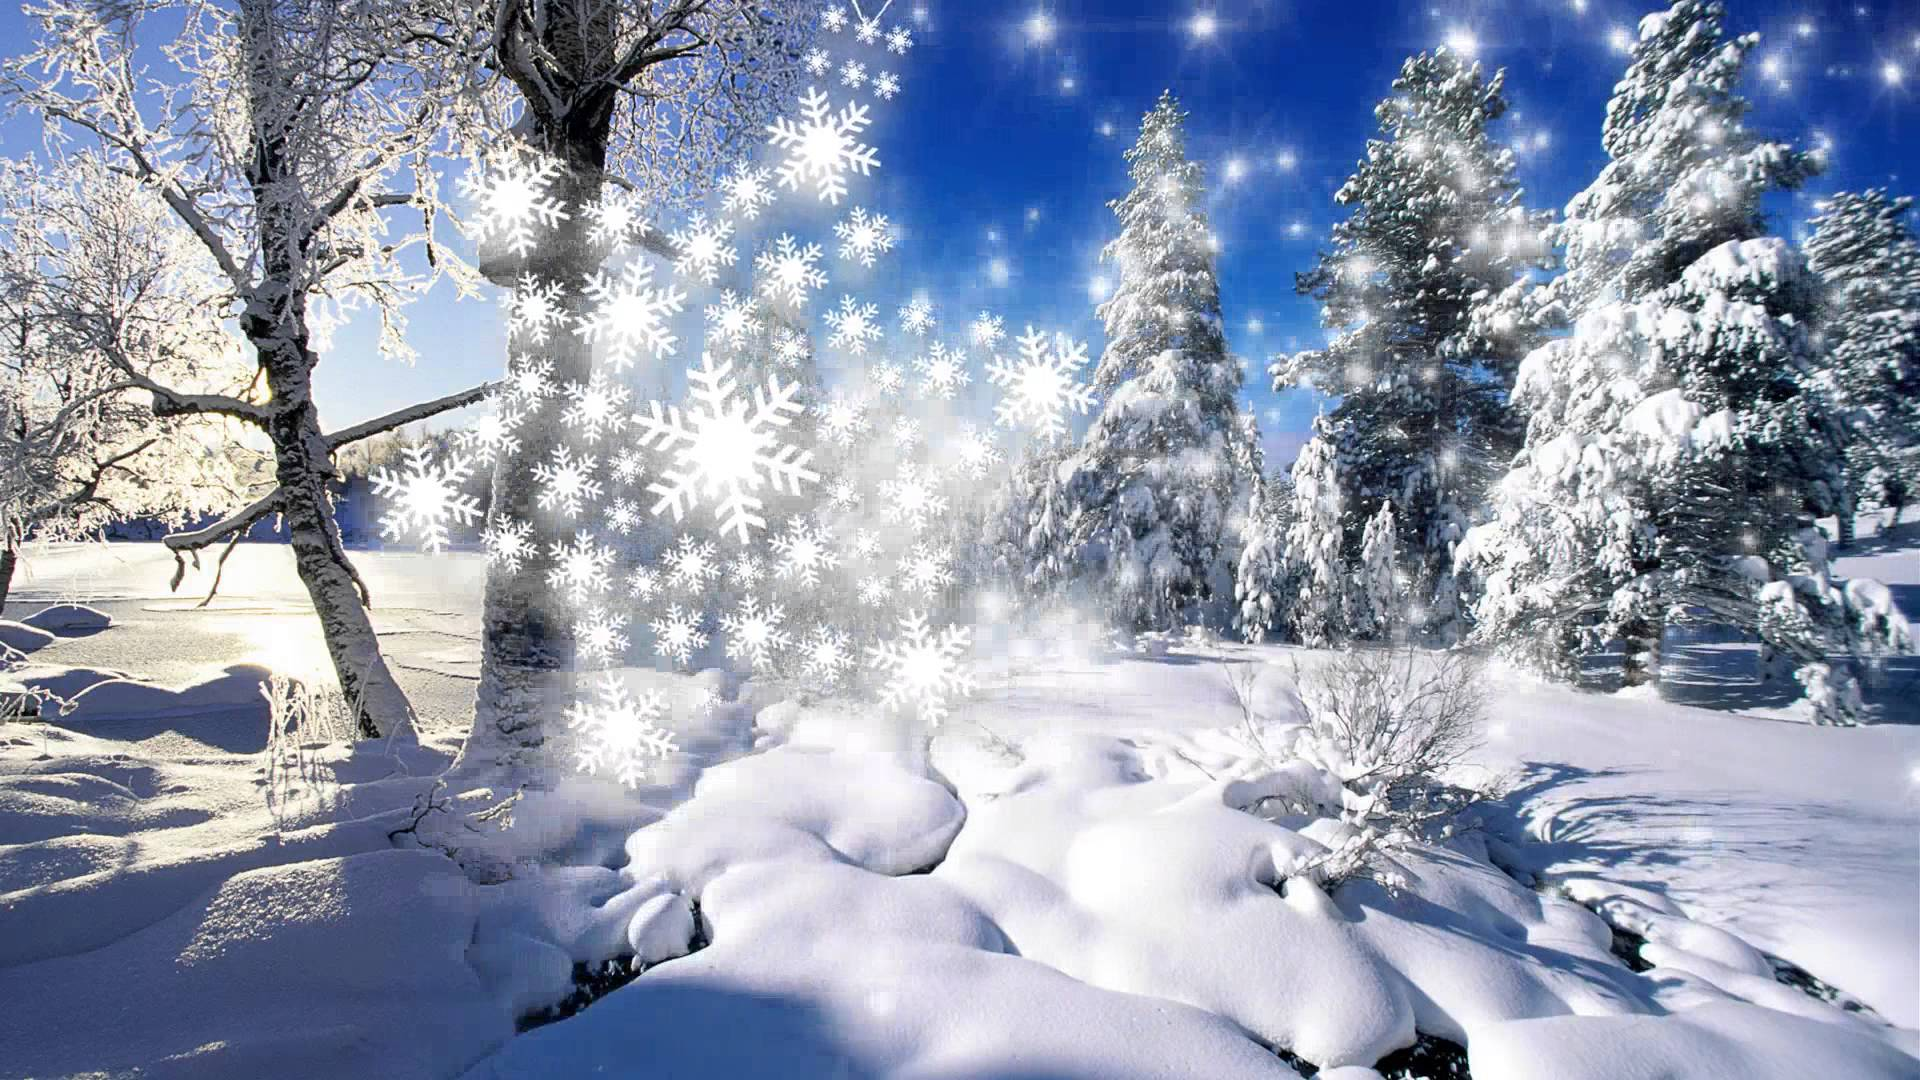 Волшебный снег картинки